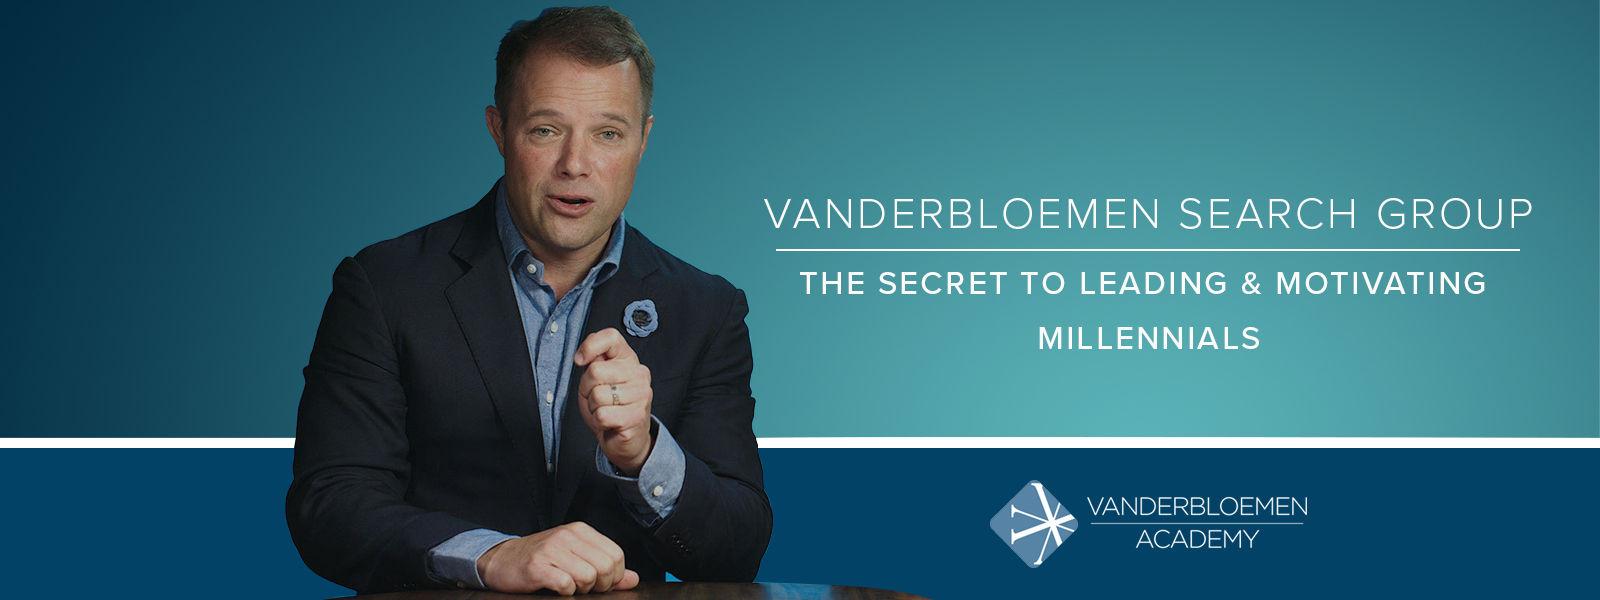 The Secret to Leading & Motivating Millennials